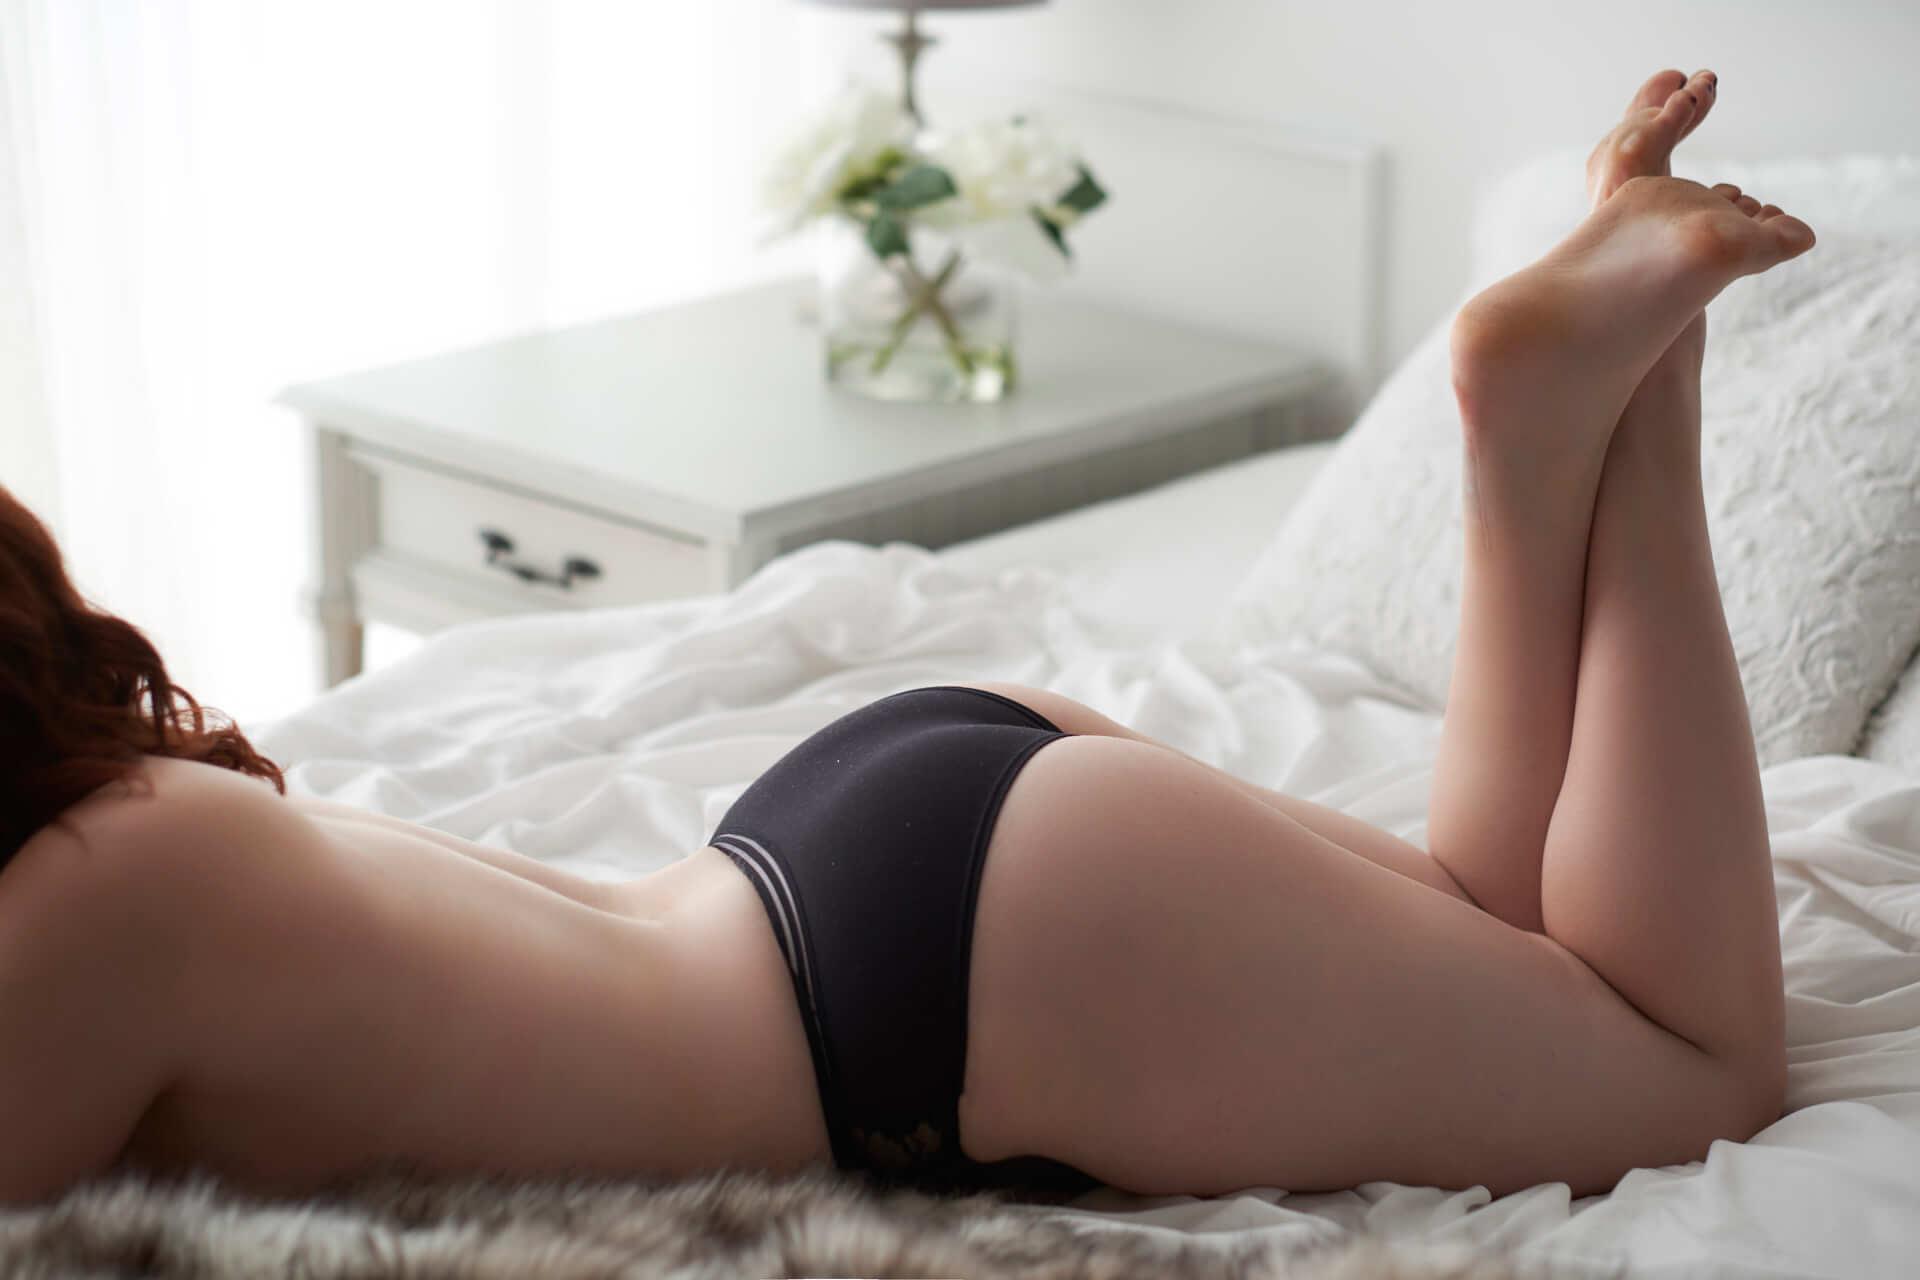 Toronto boudoir photography studio empowerment sexy bedroom pictures lingerie photographer